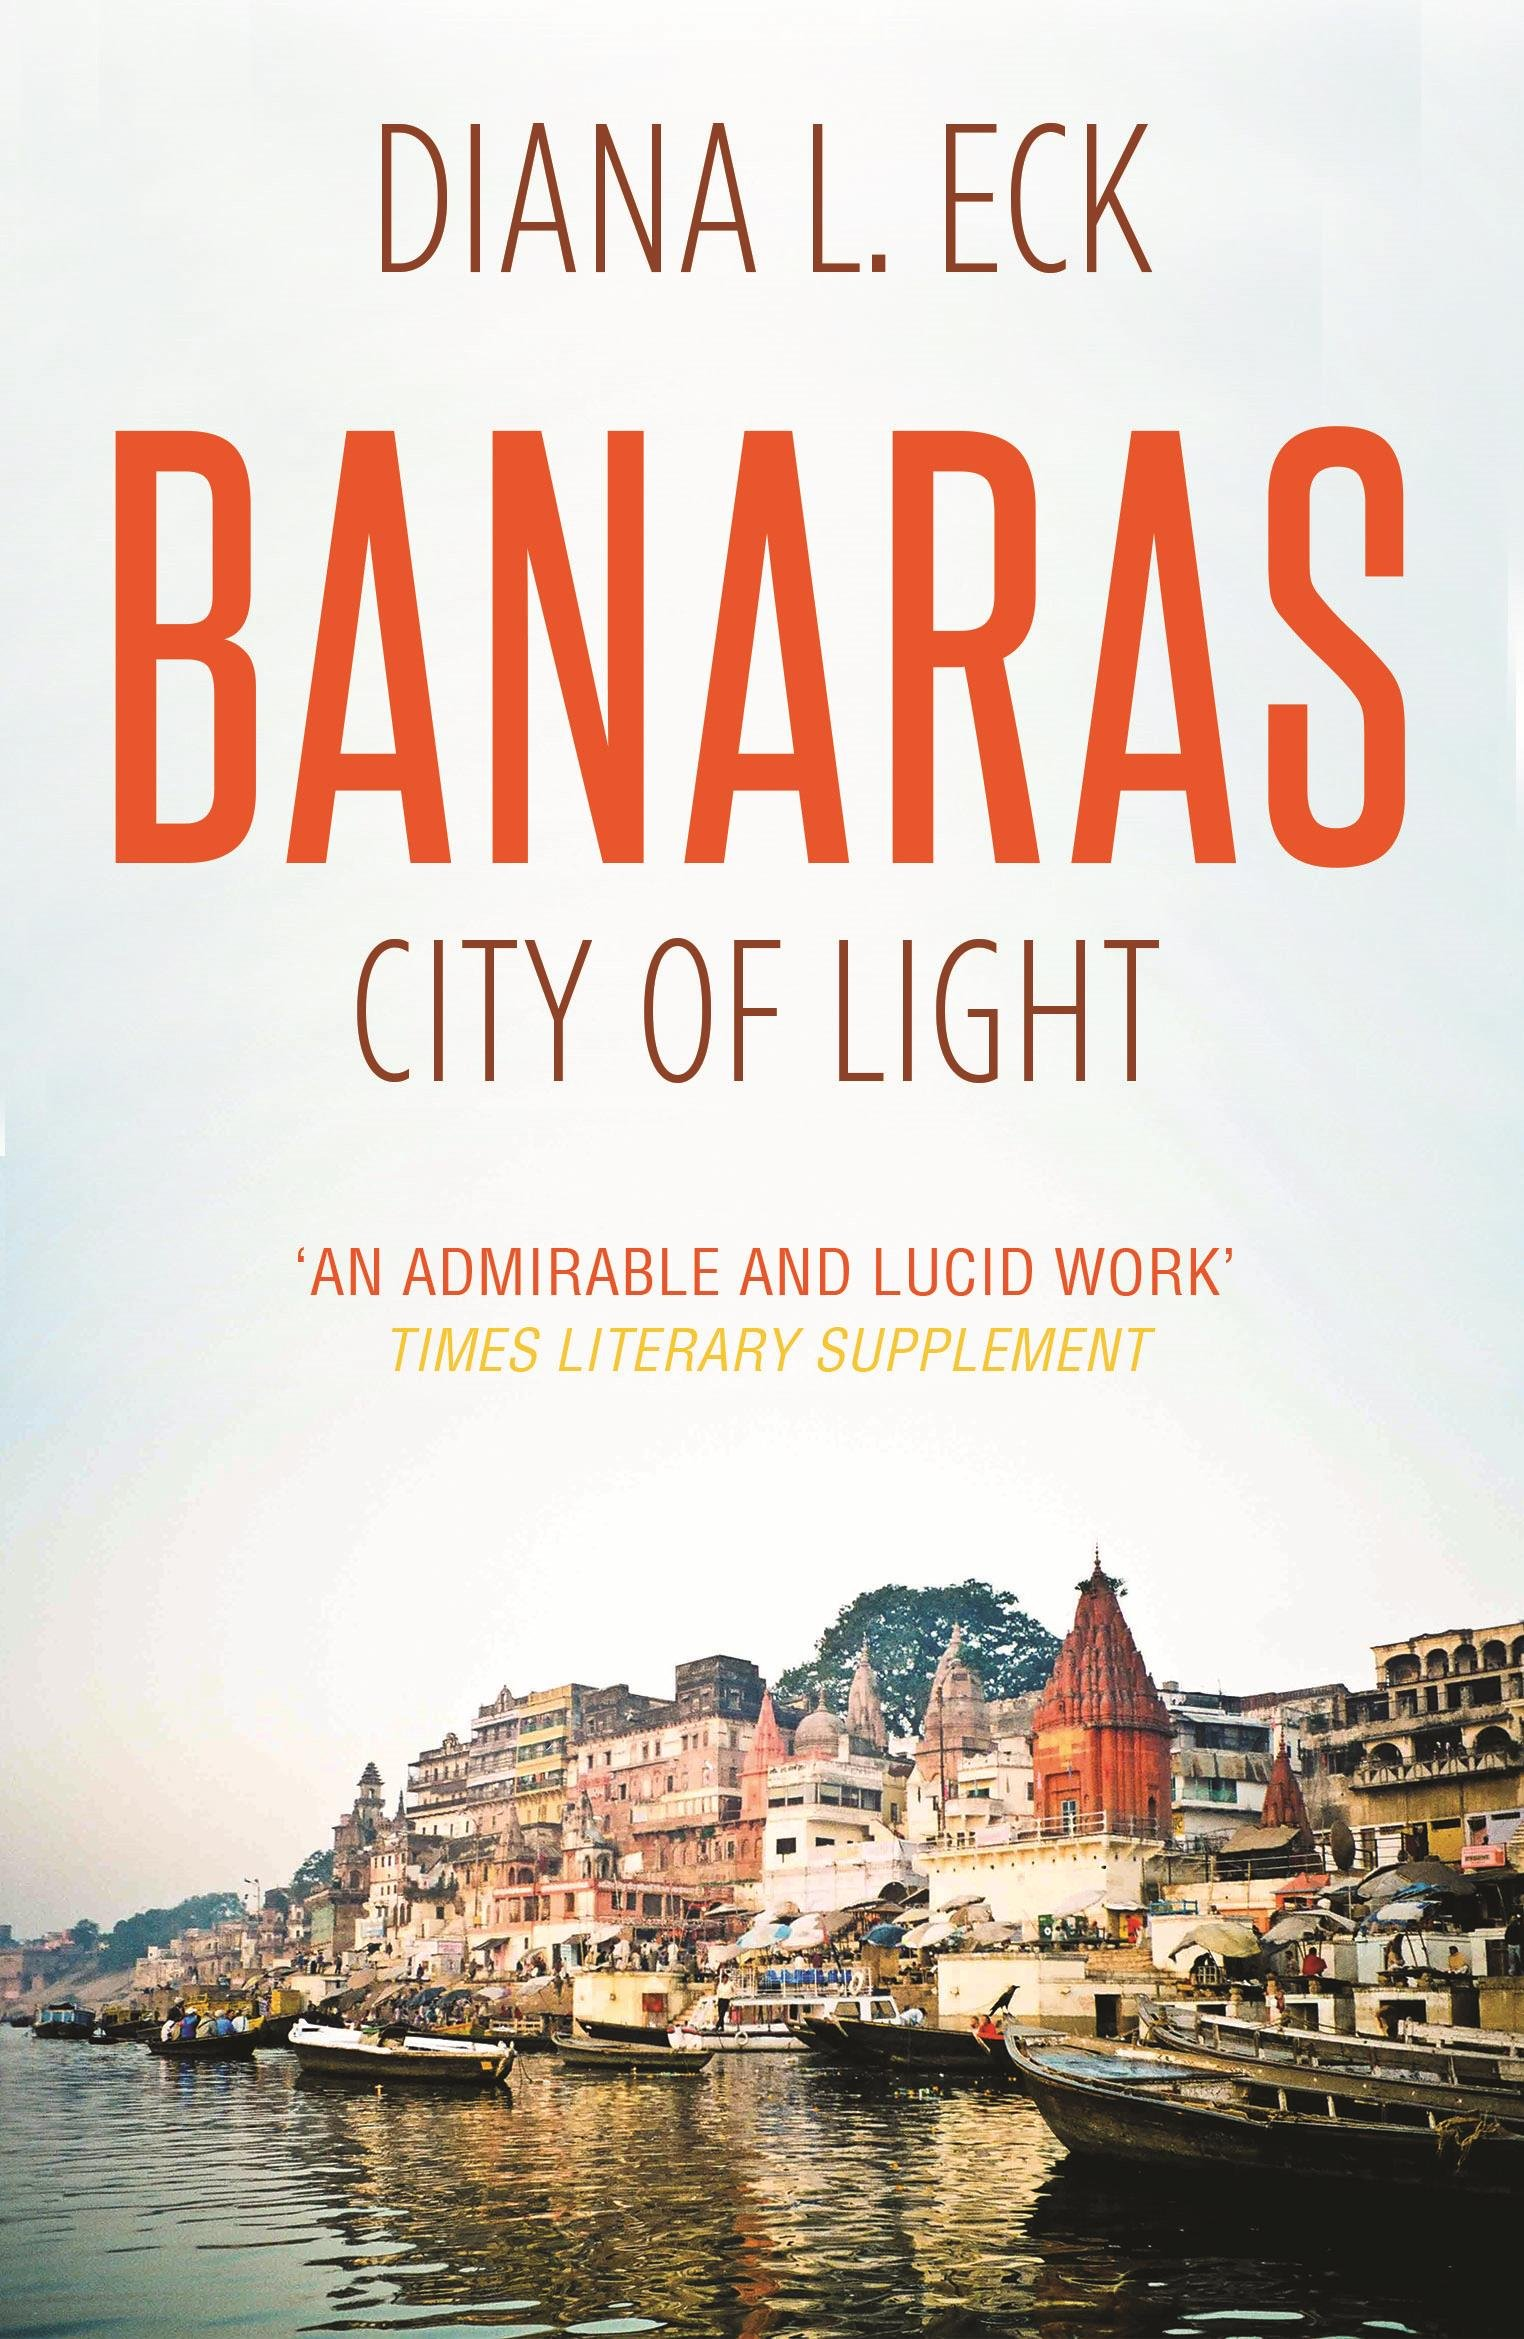 Banaras - City of Light